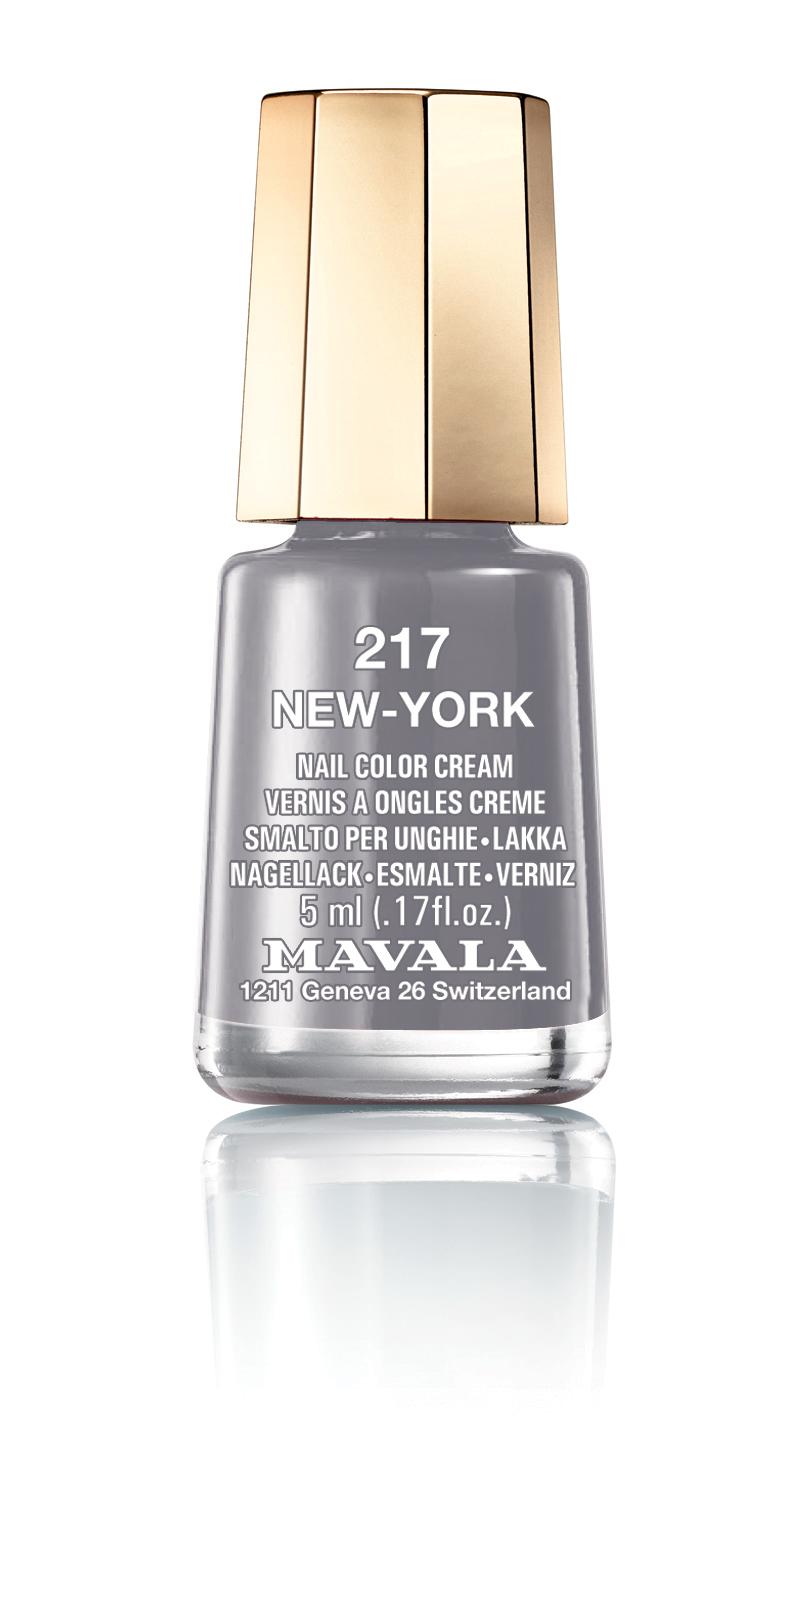 217 NEW-YORK